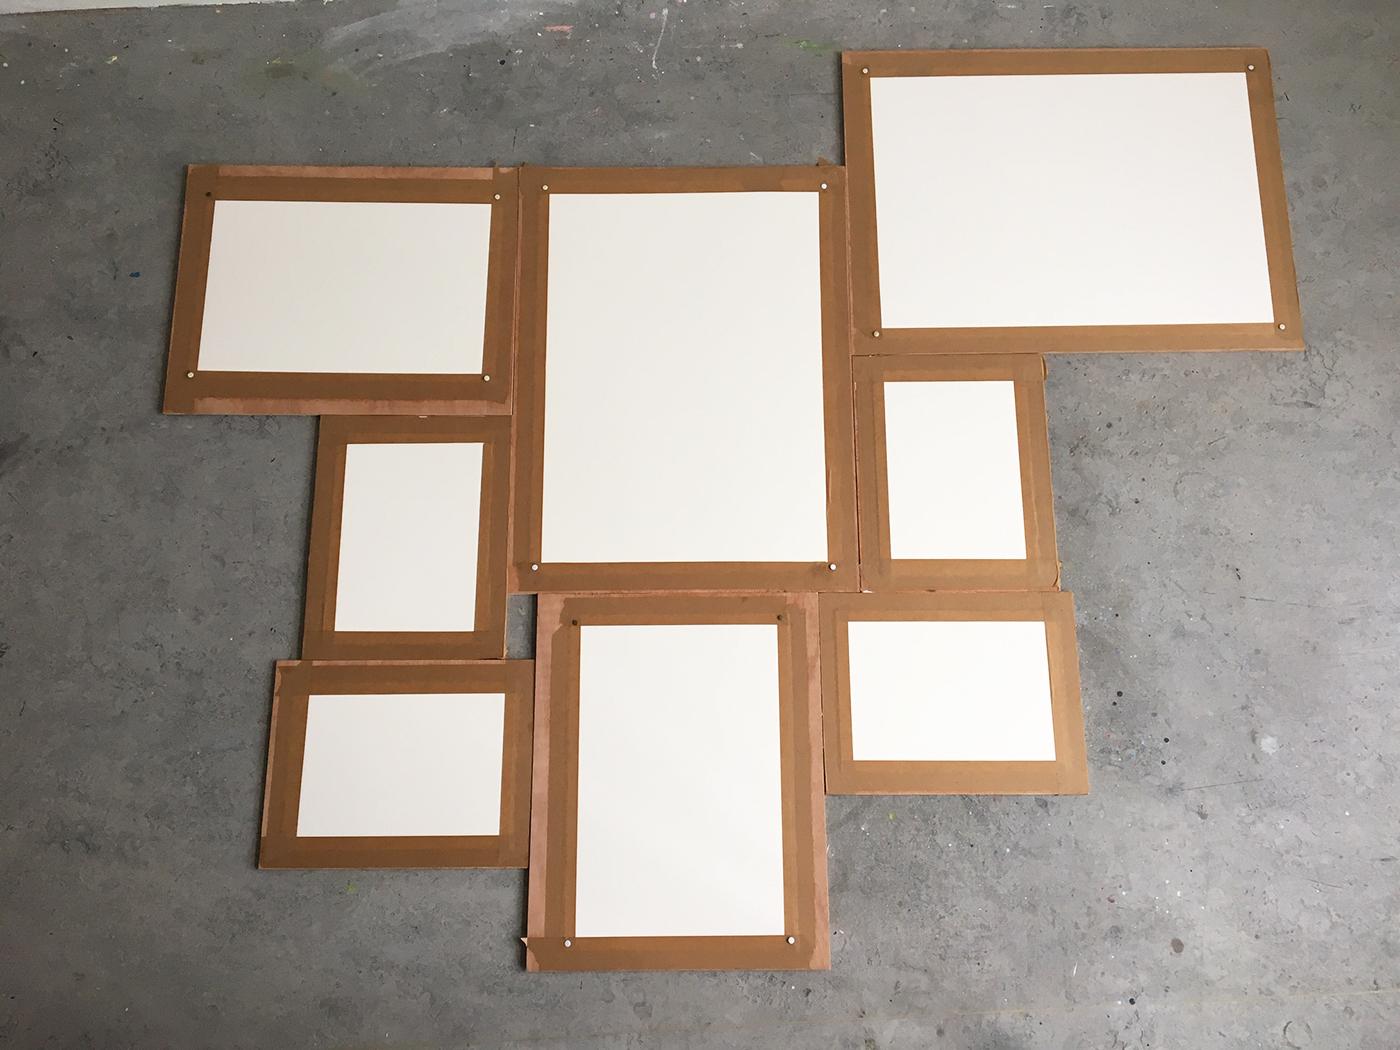 opgespannen aquarelpapier